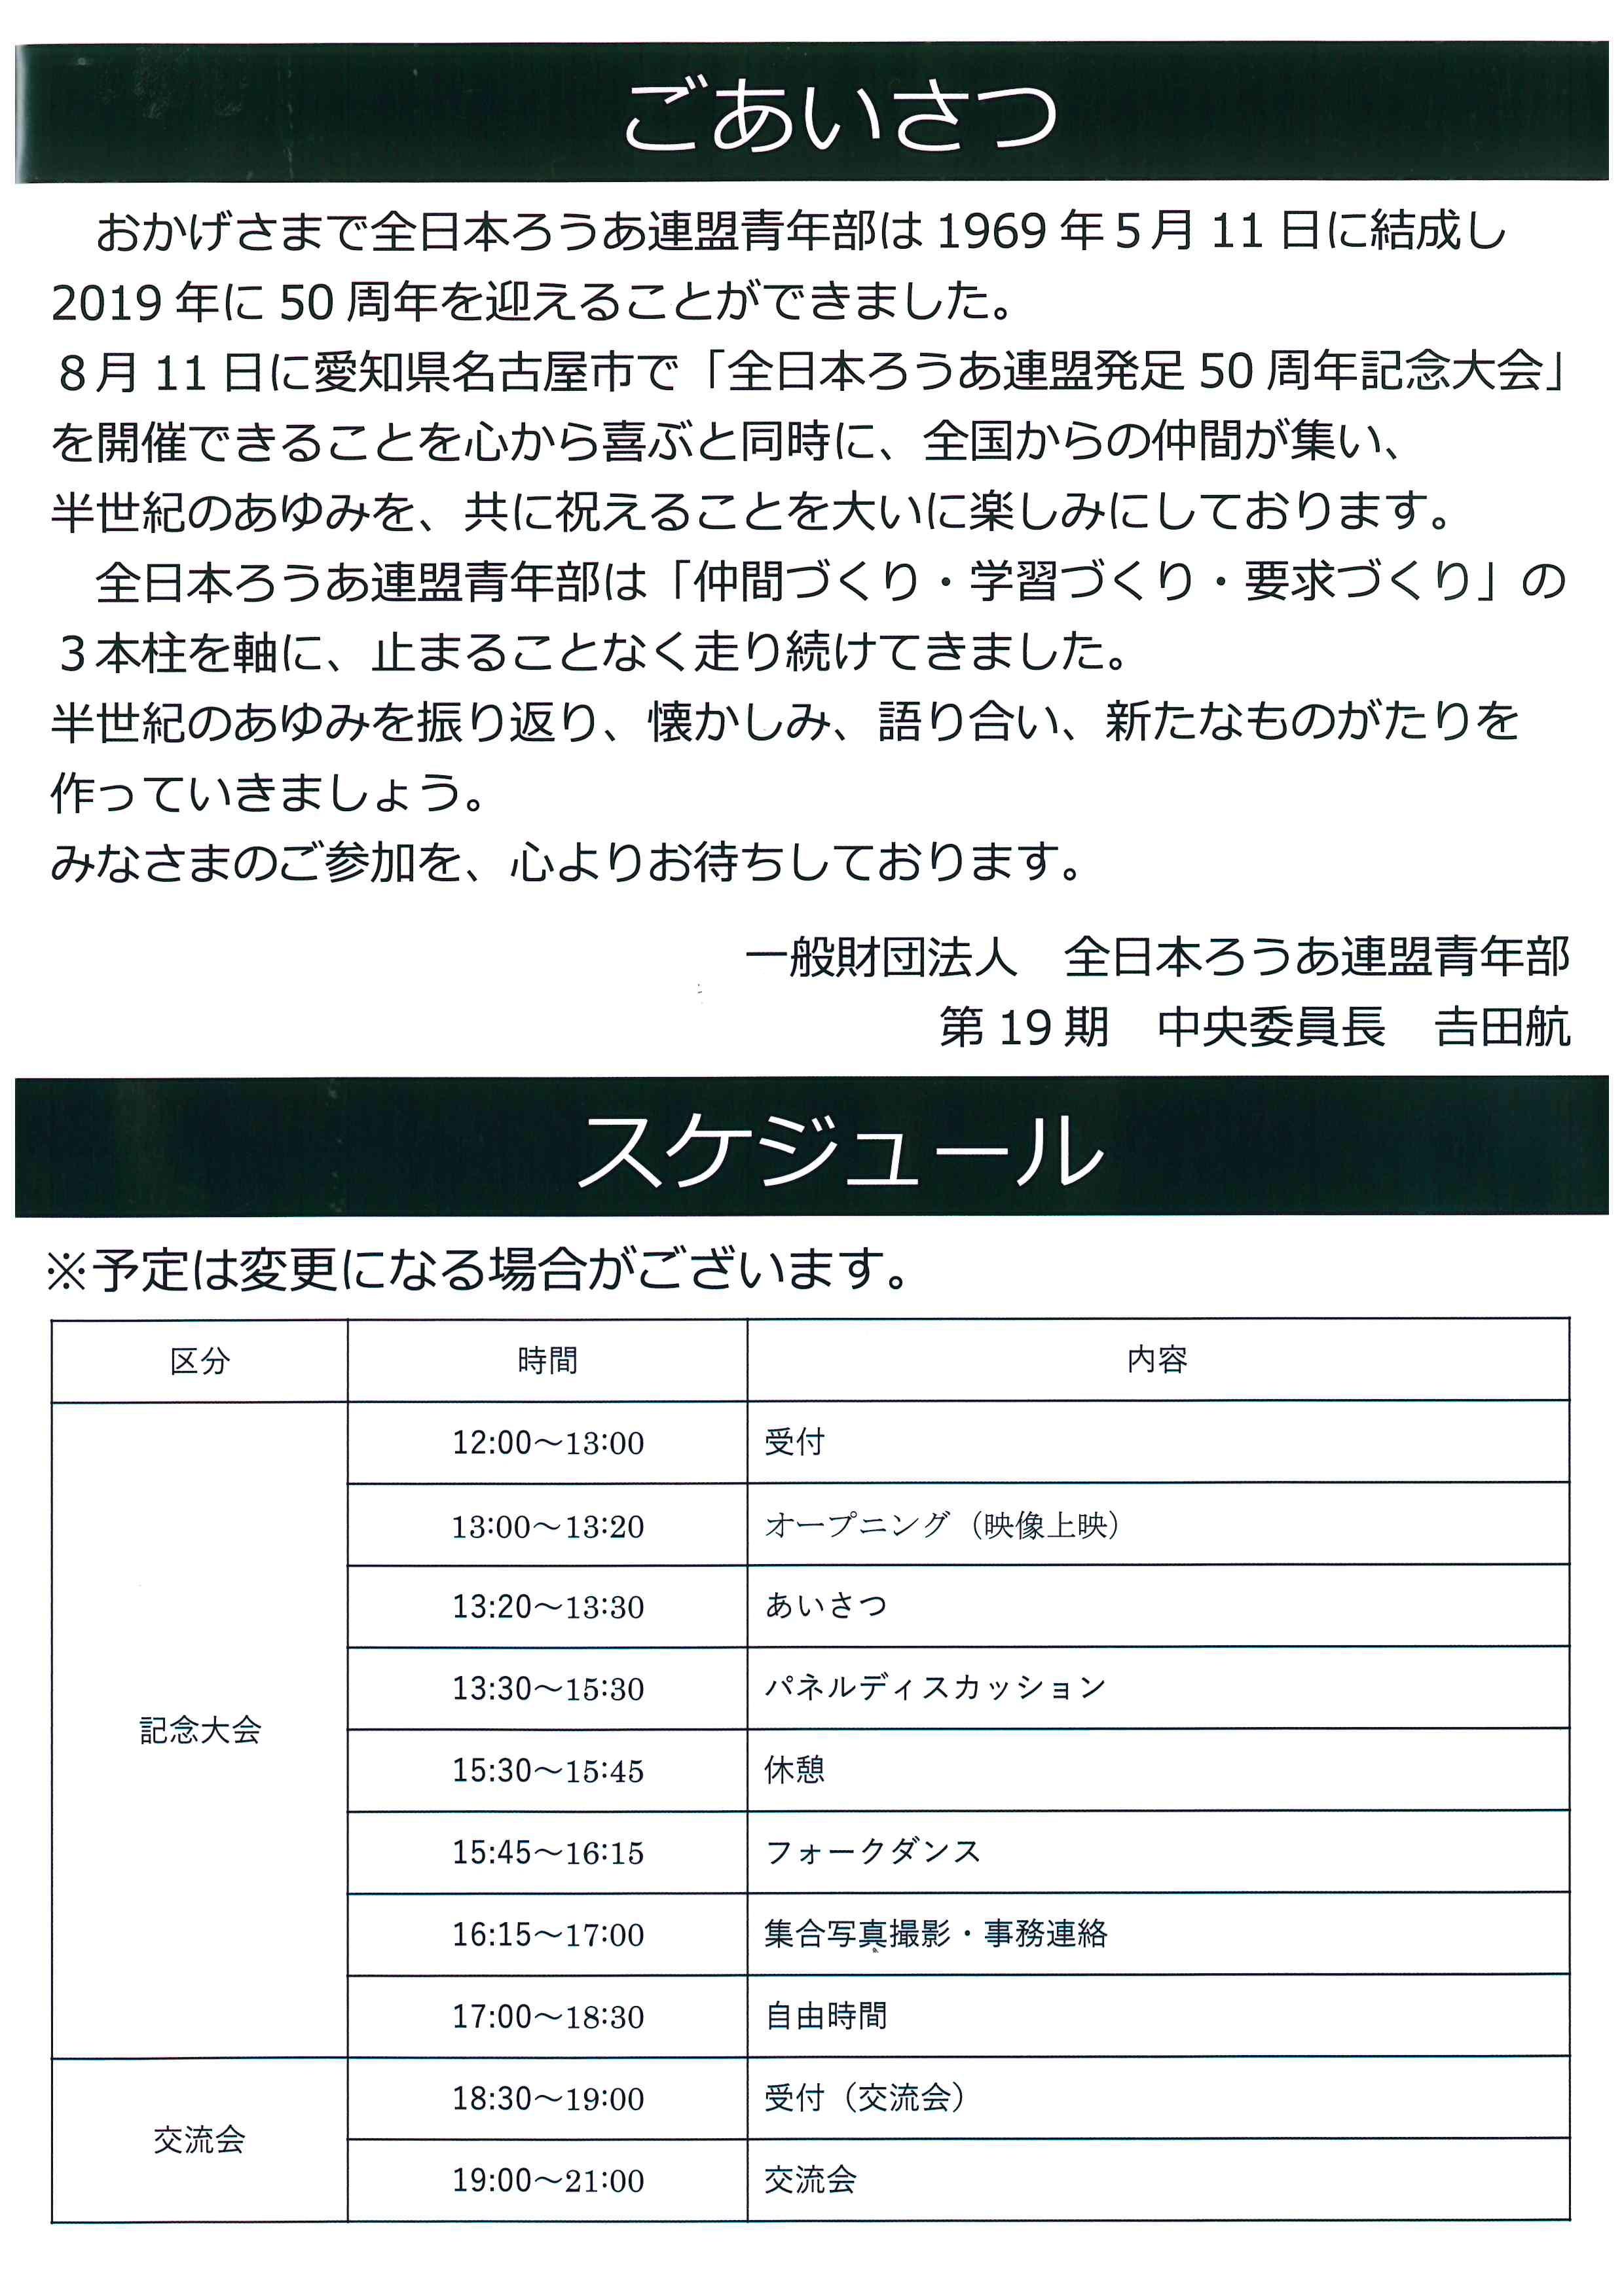 全日本ろうあ連盟青年部発足50周年記念大会 2次募集_d0070316_16151660.jpg